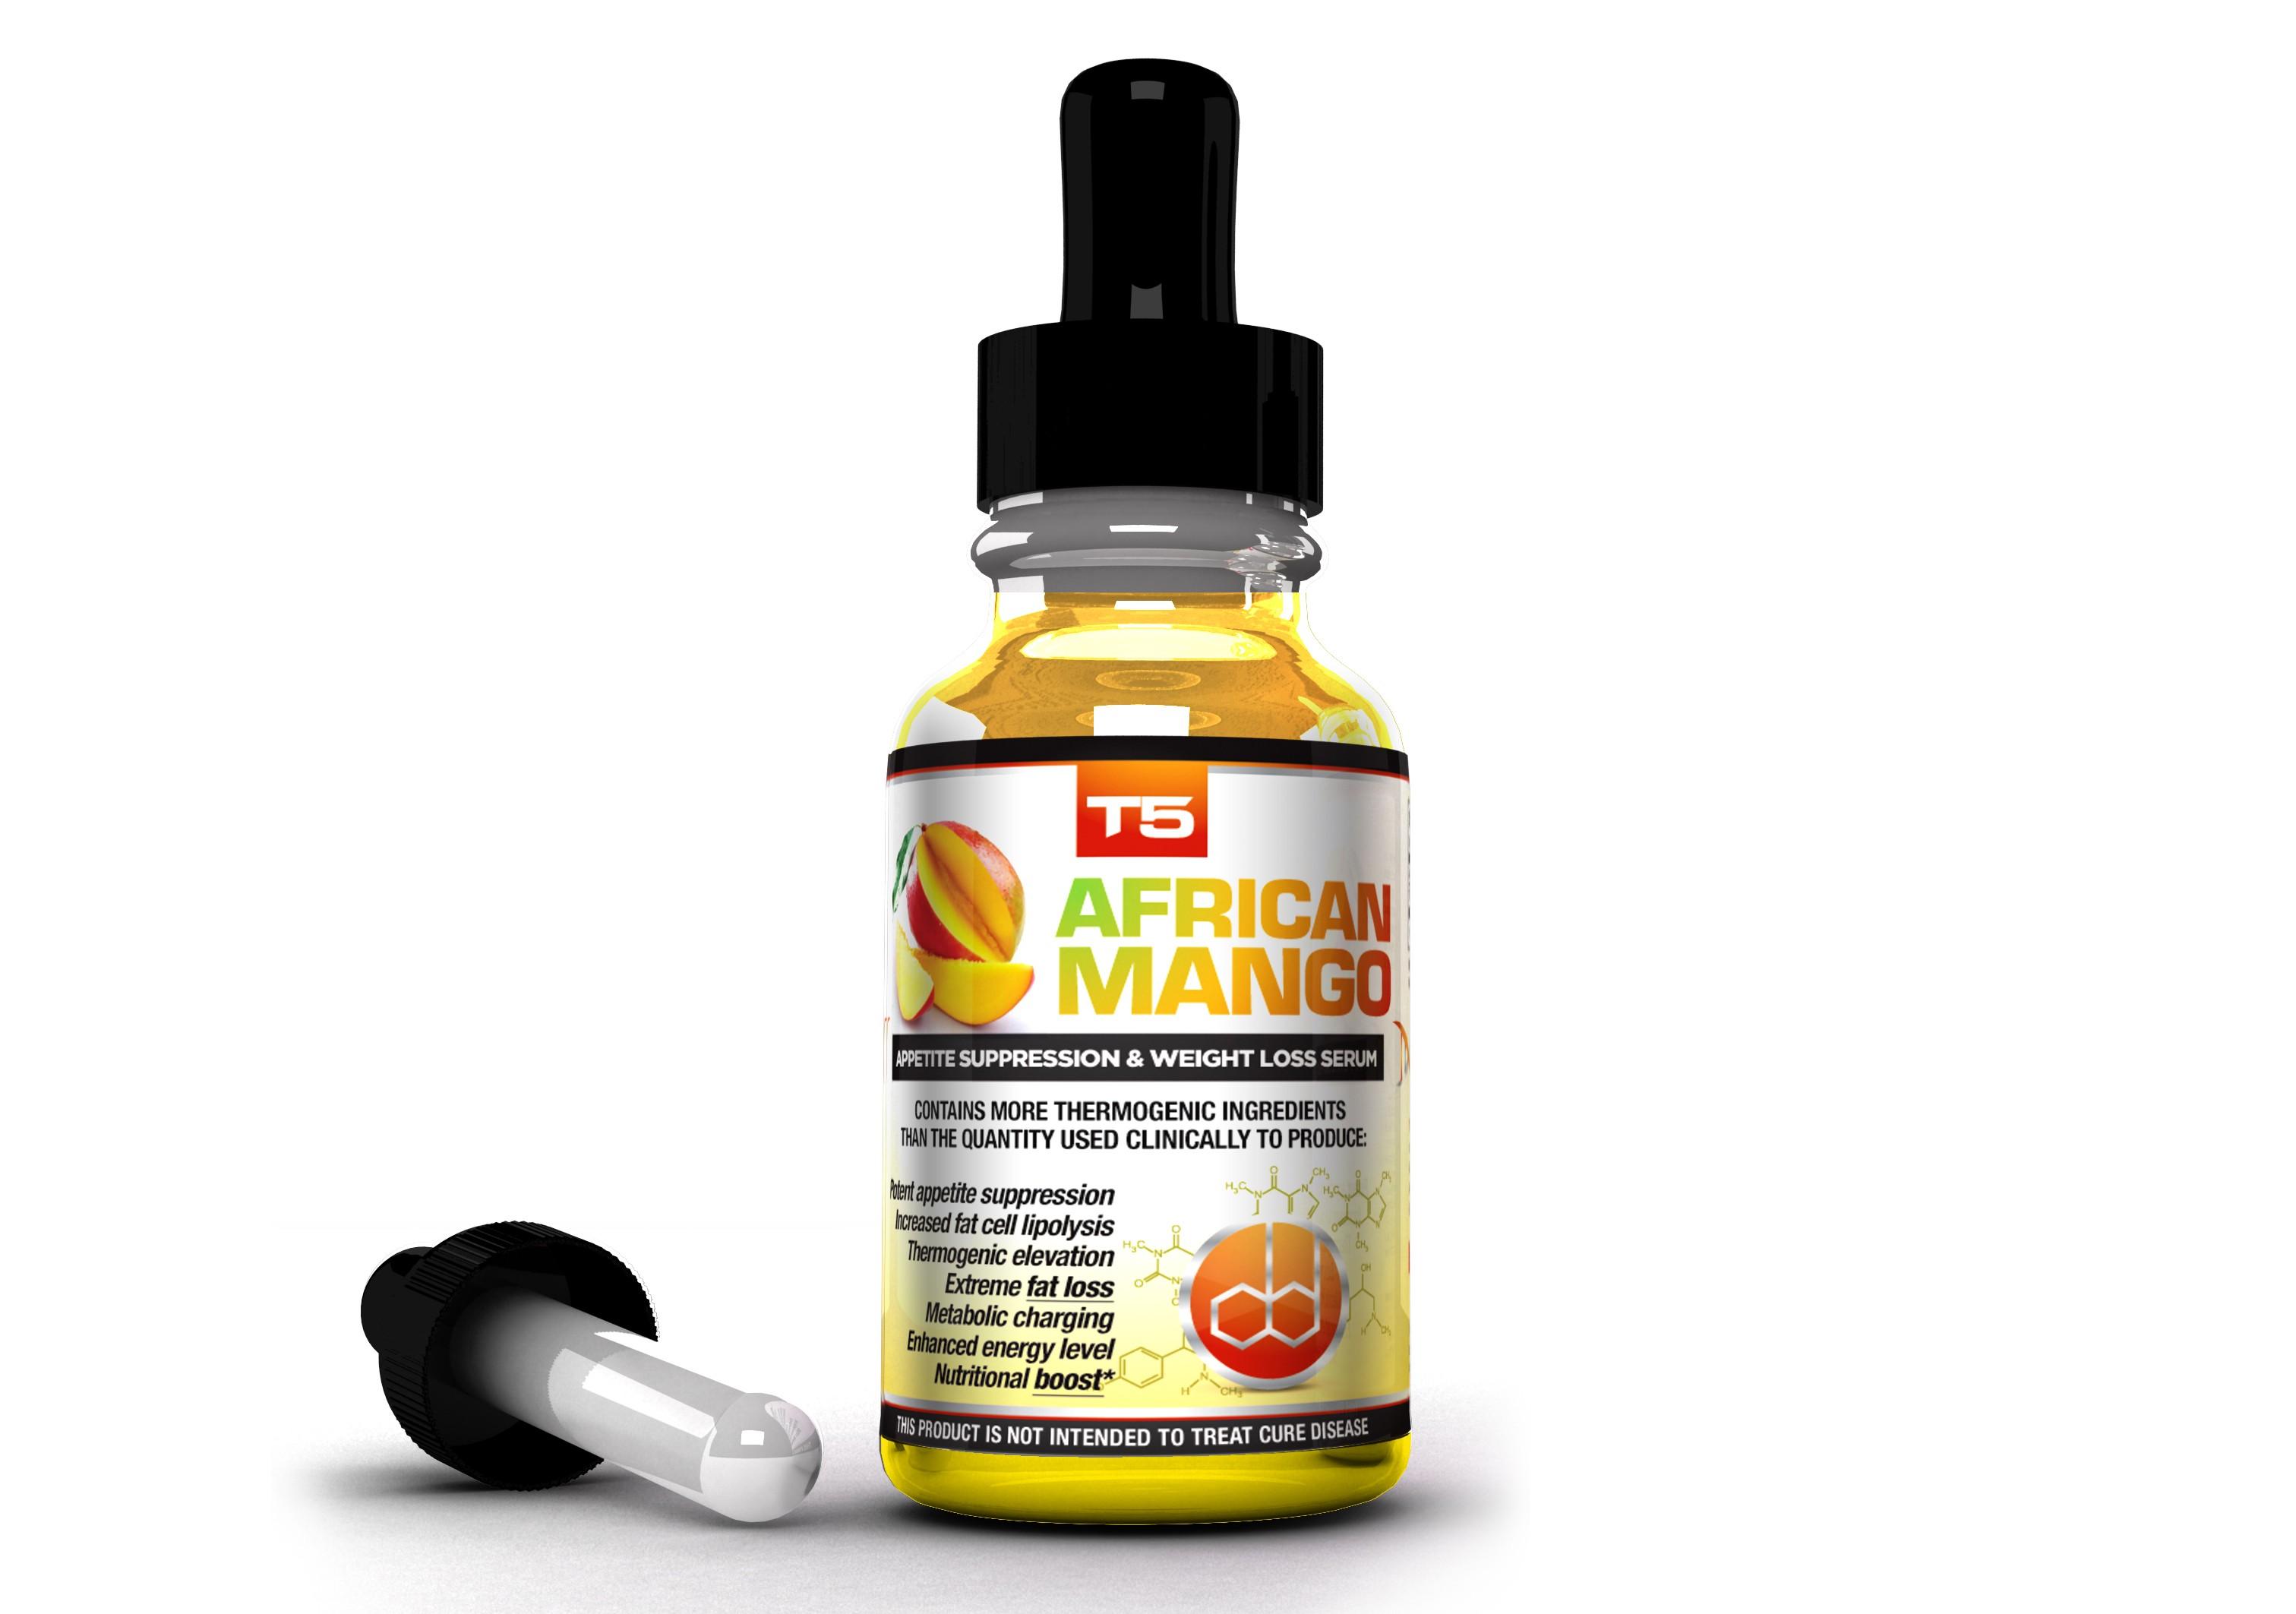 T5 African Mango